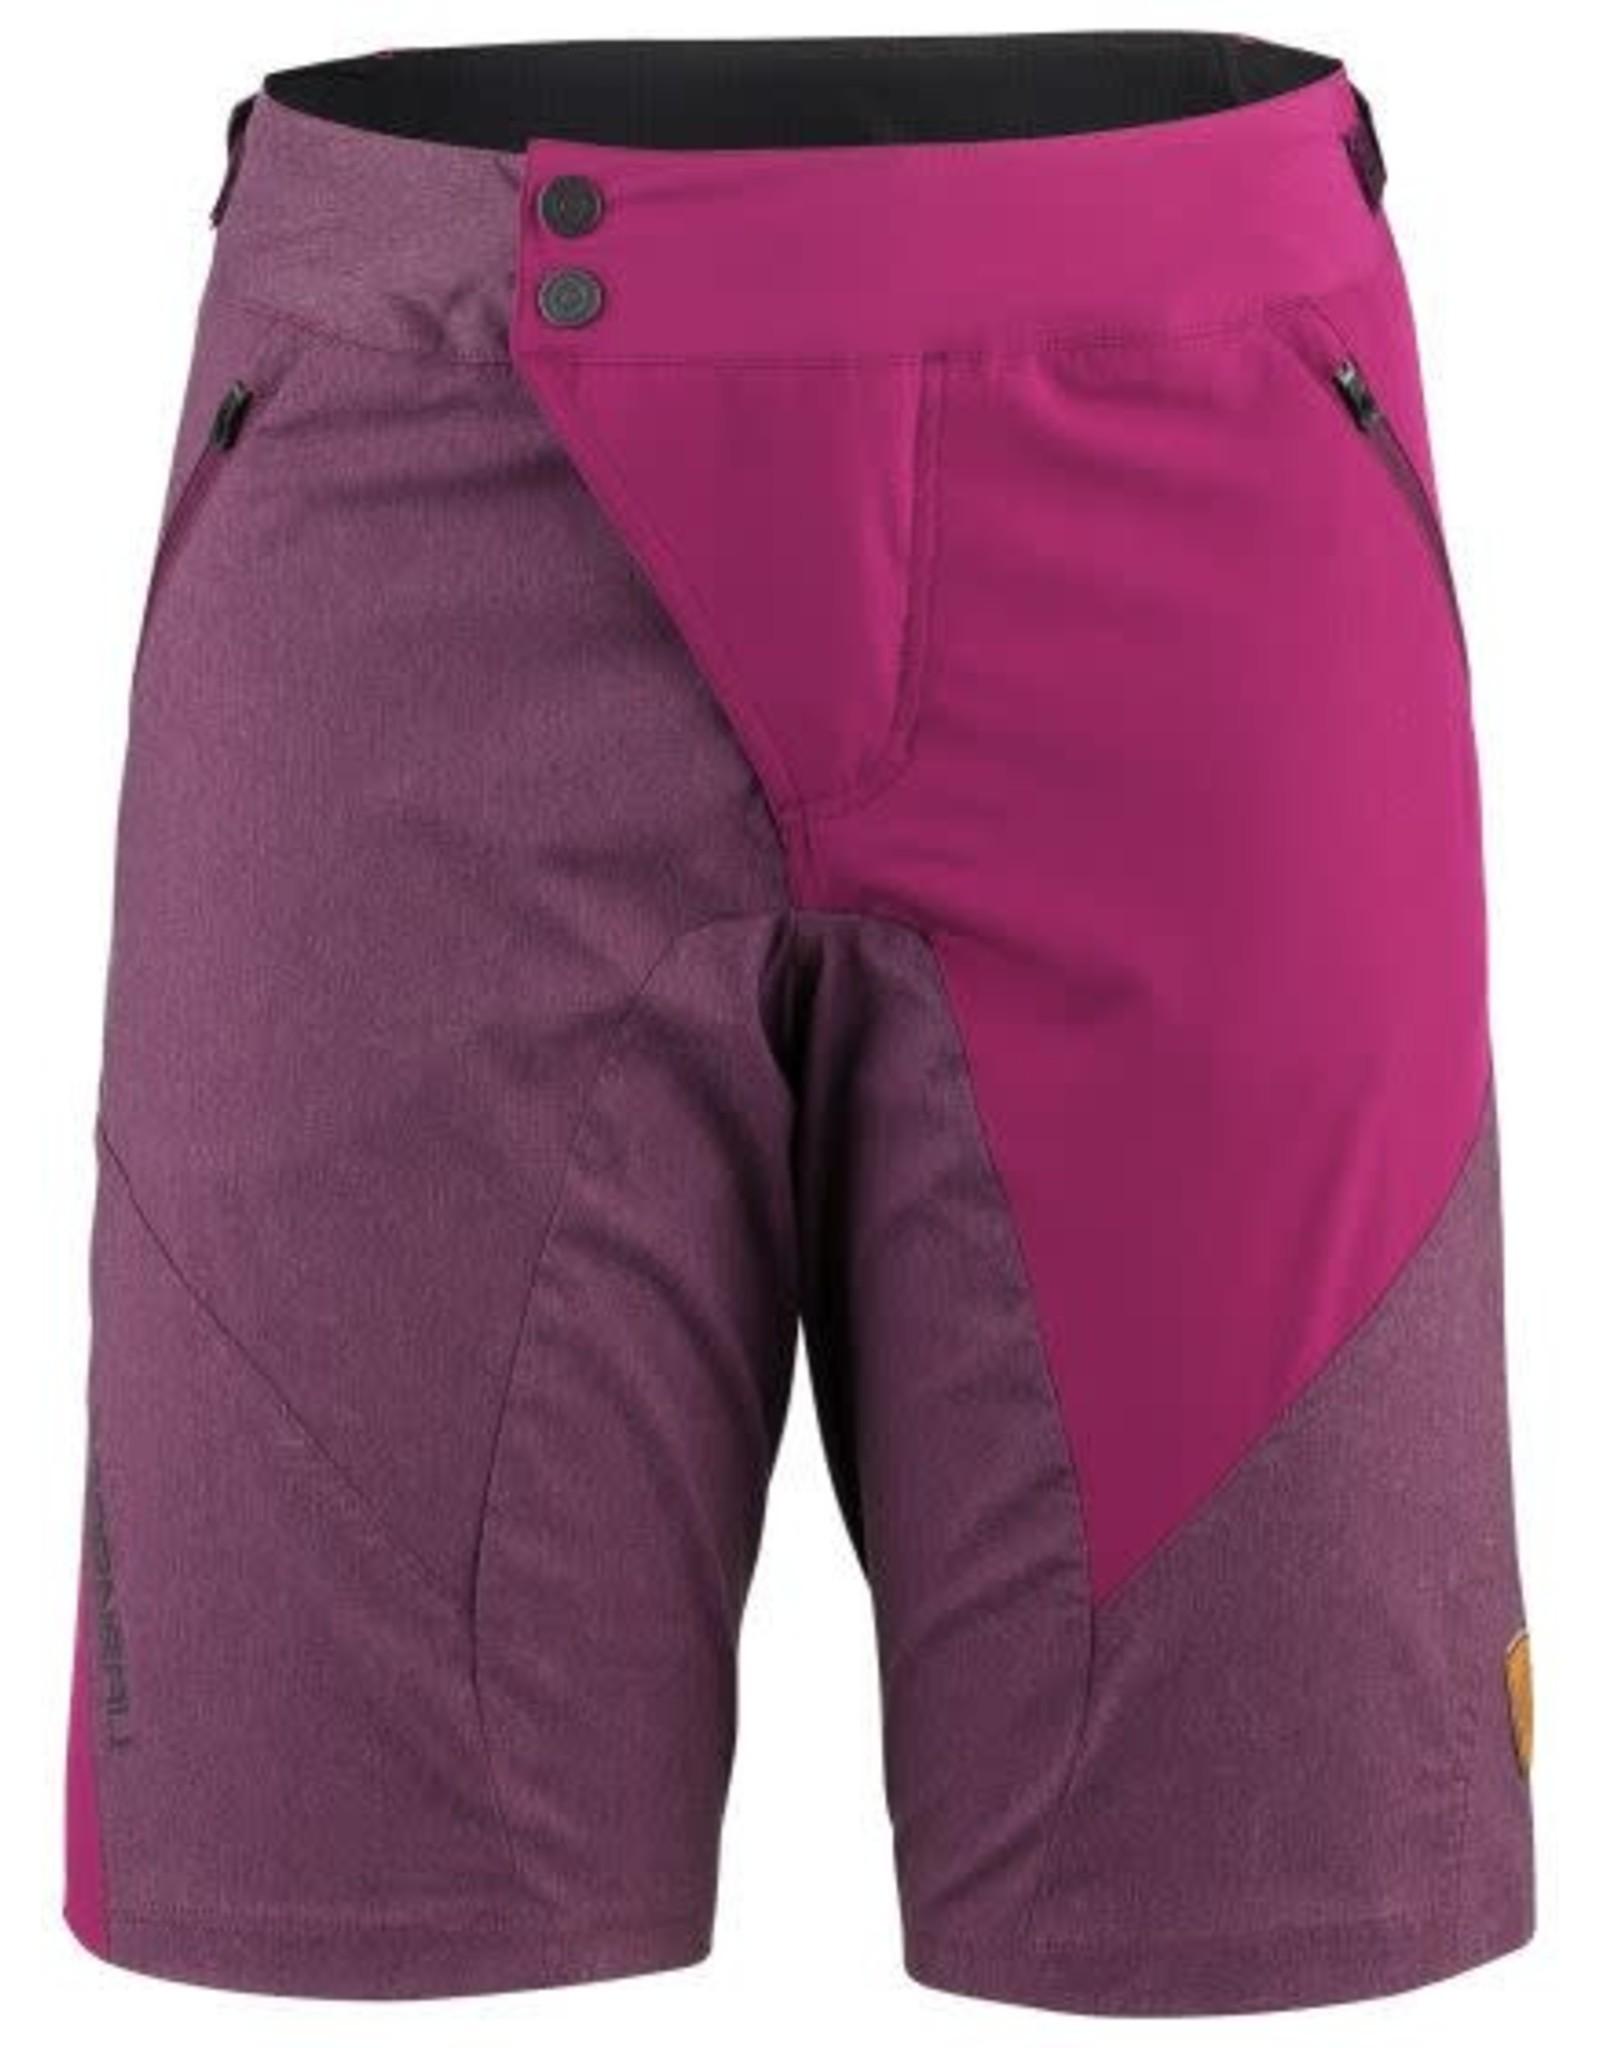 Garneau GARNEAU W Dirt Shorts S19